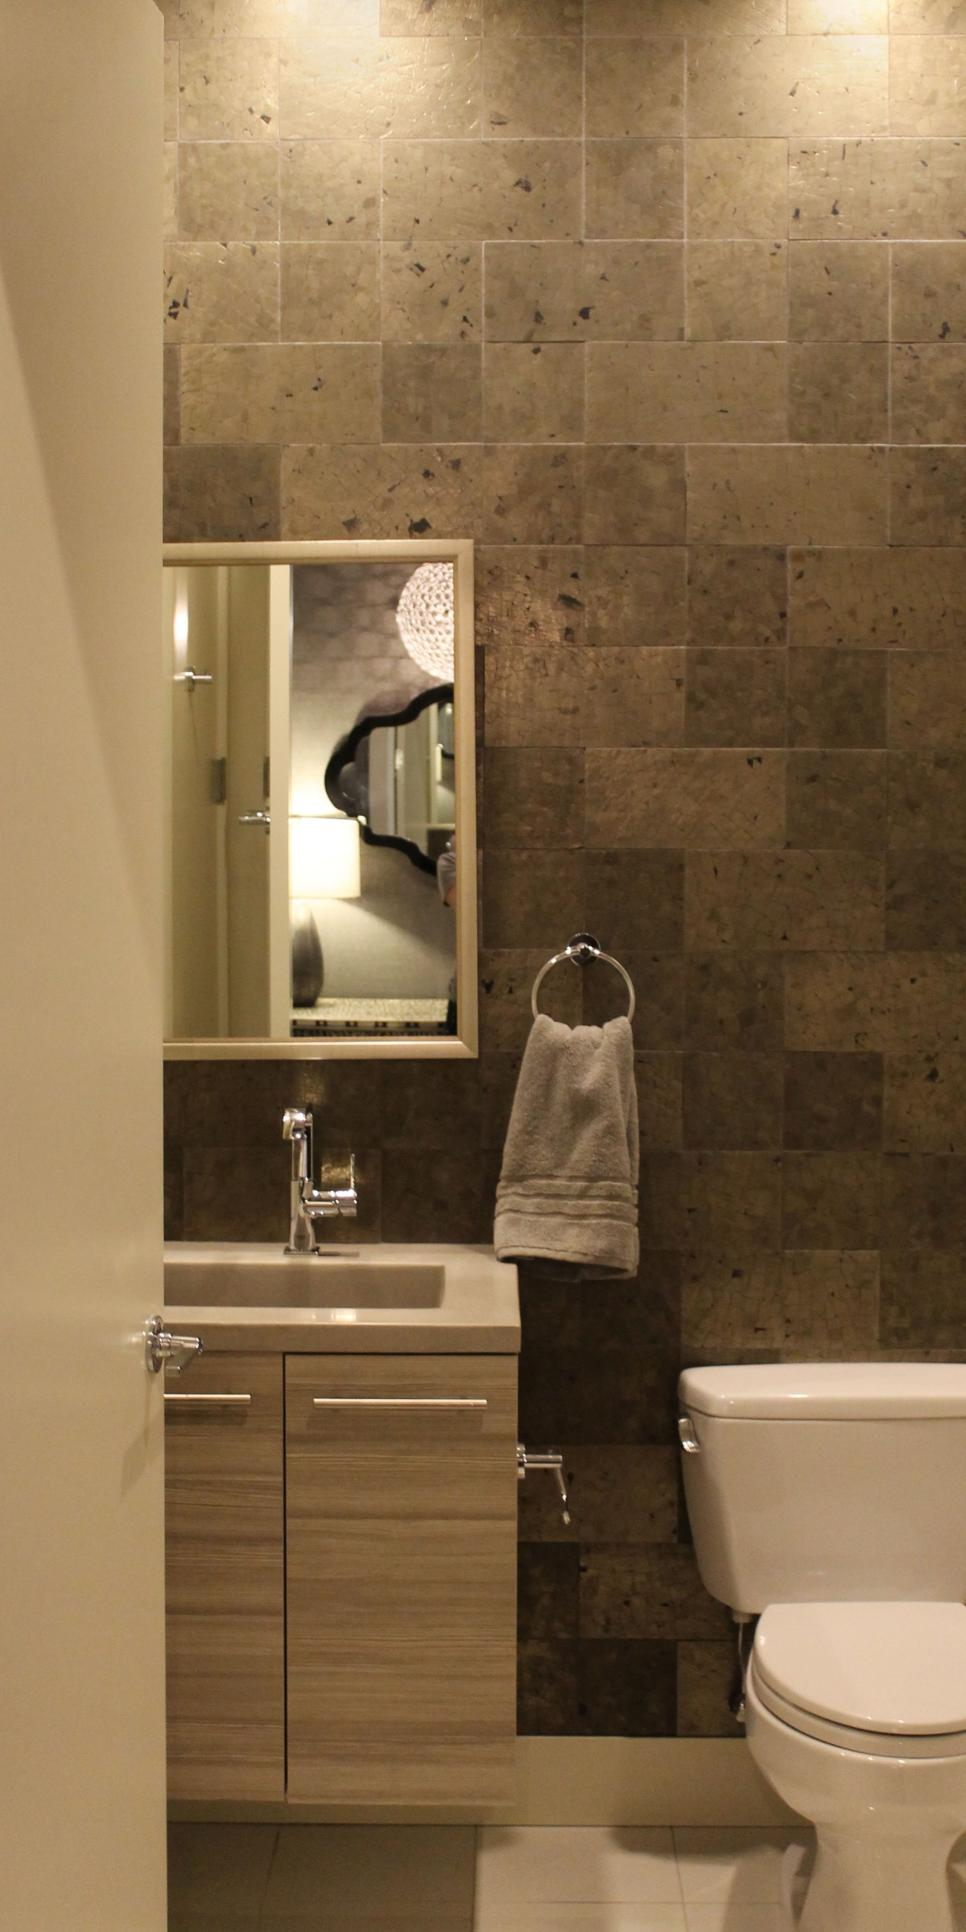 Modern Powder Room With Stone Tile Backsplash Floating Vanity And Modern Fixtures Hgtv